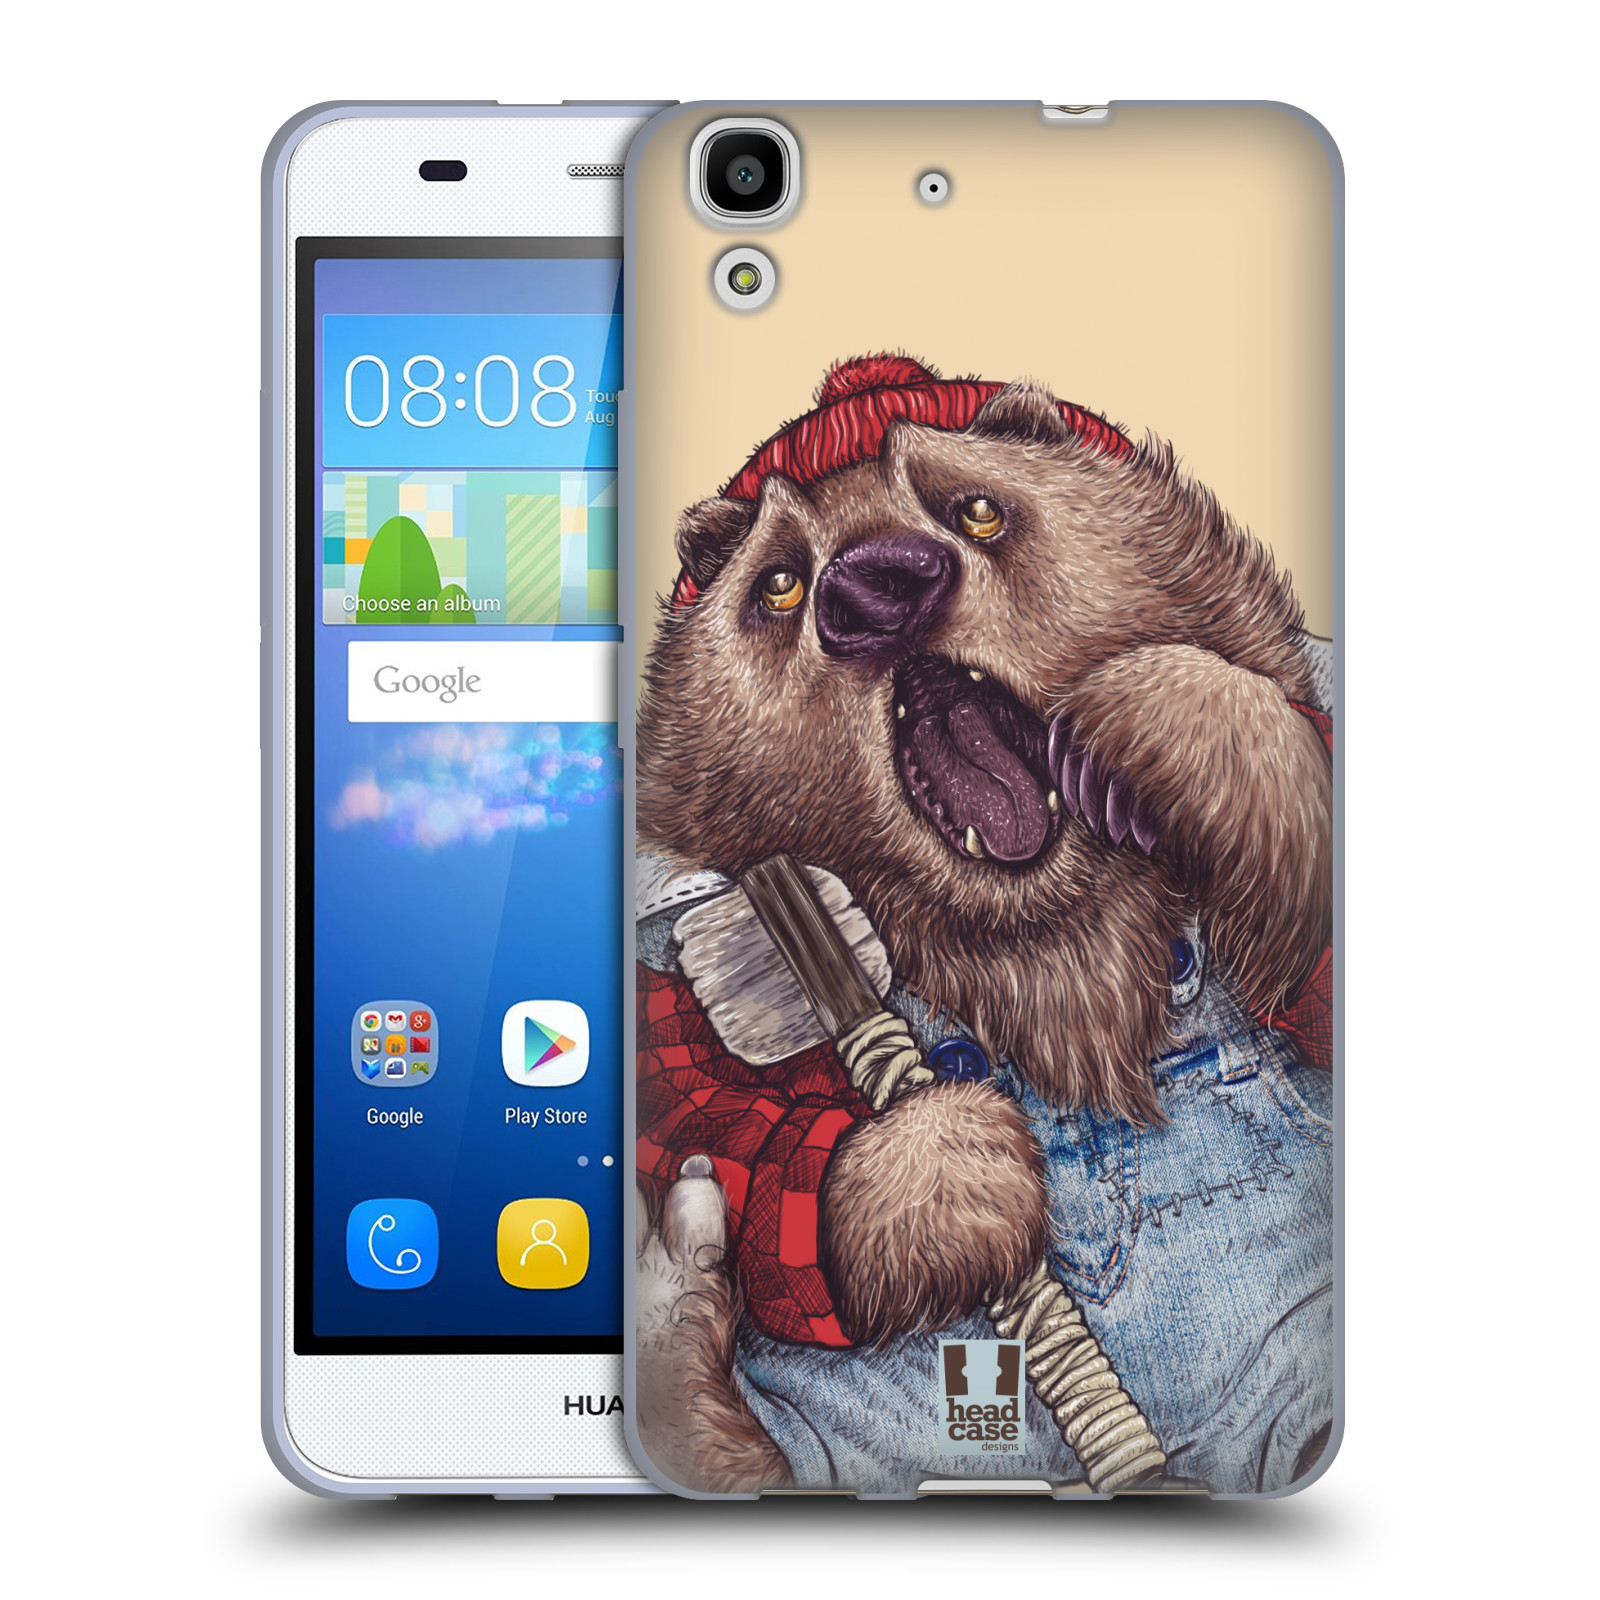 Silikonové pouzdro na mobil Huawei Y6 HEAD CASE ANIMPLA MEDVĚD